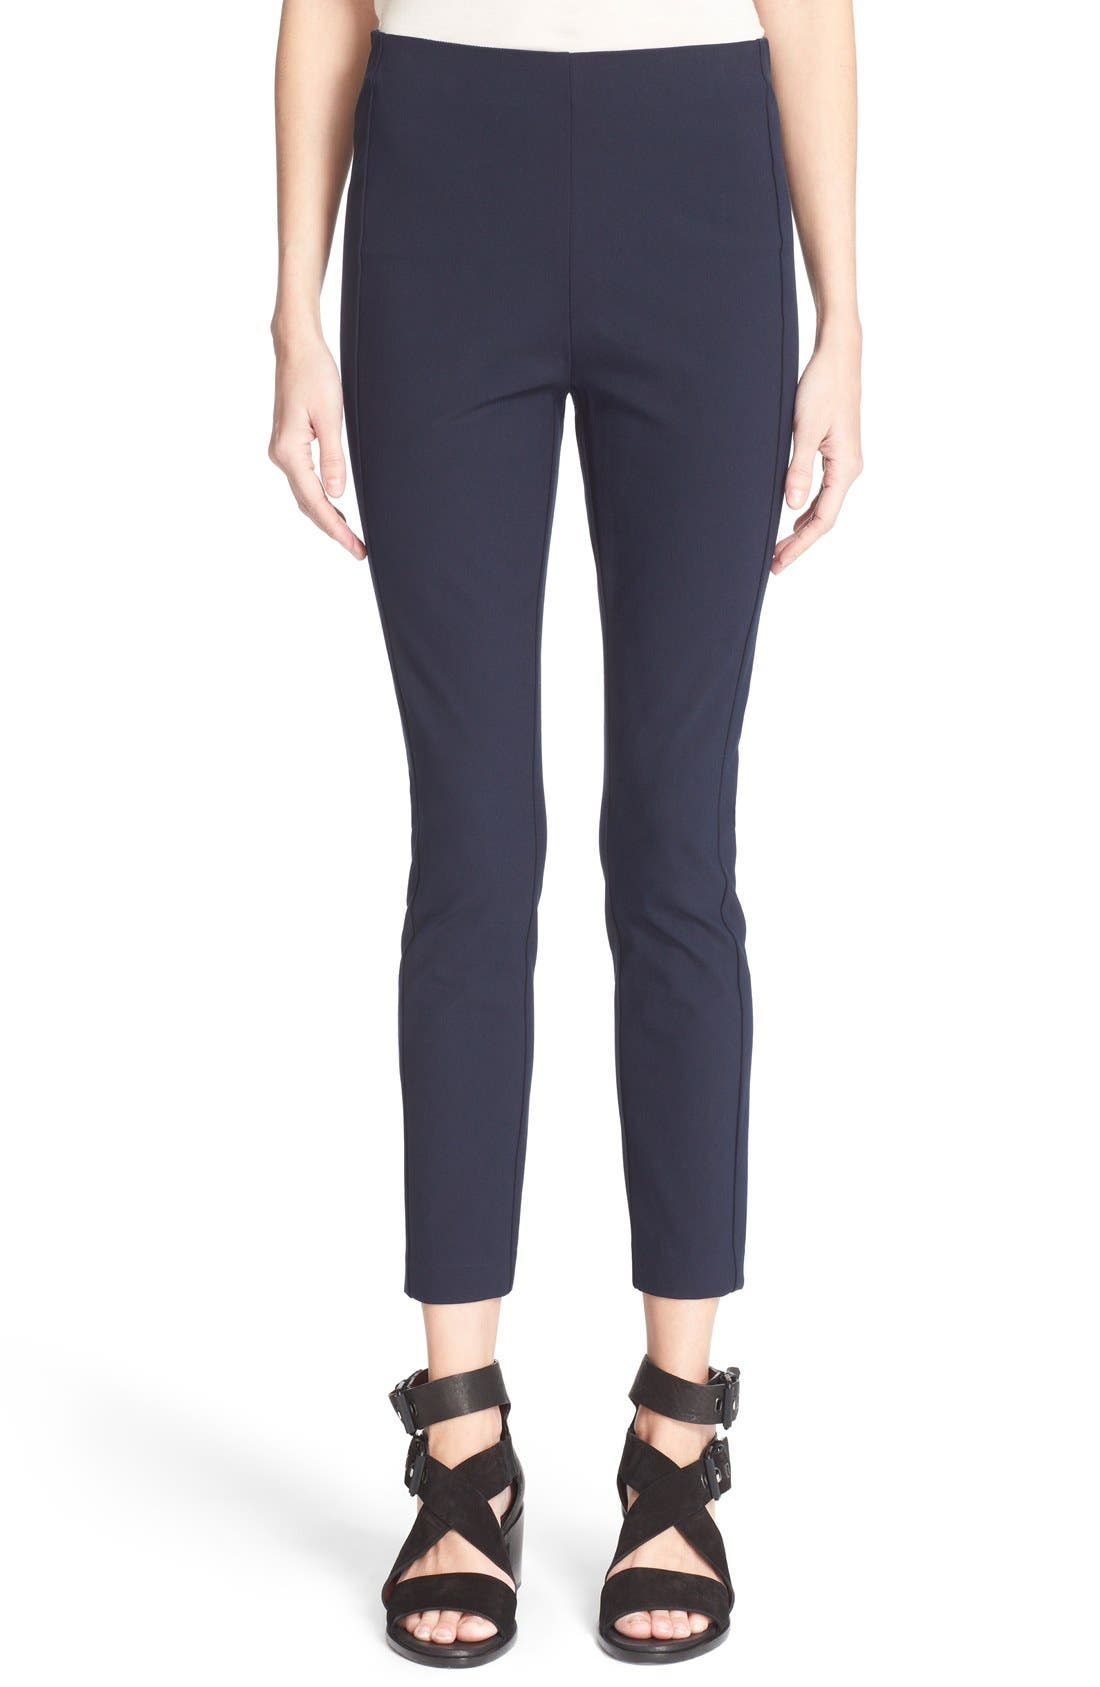 Women's Rag & Bone 'Simone' Slim Ankle Pants